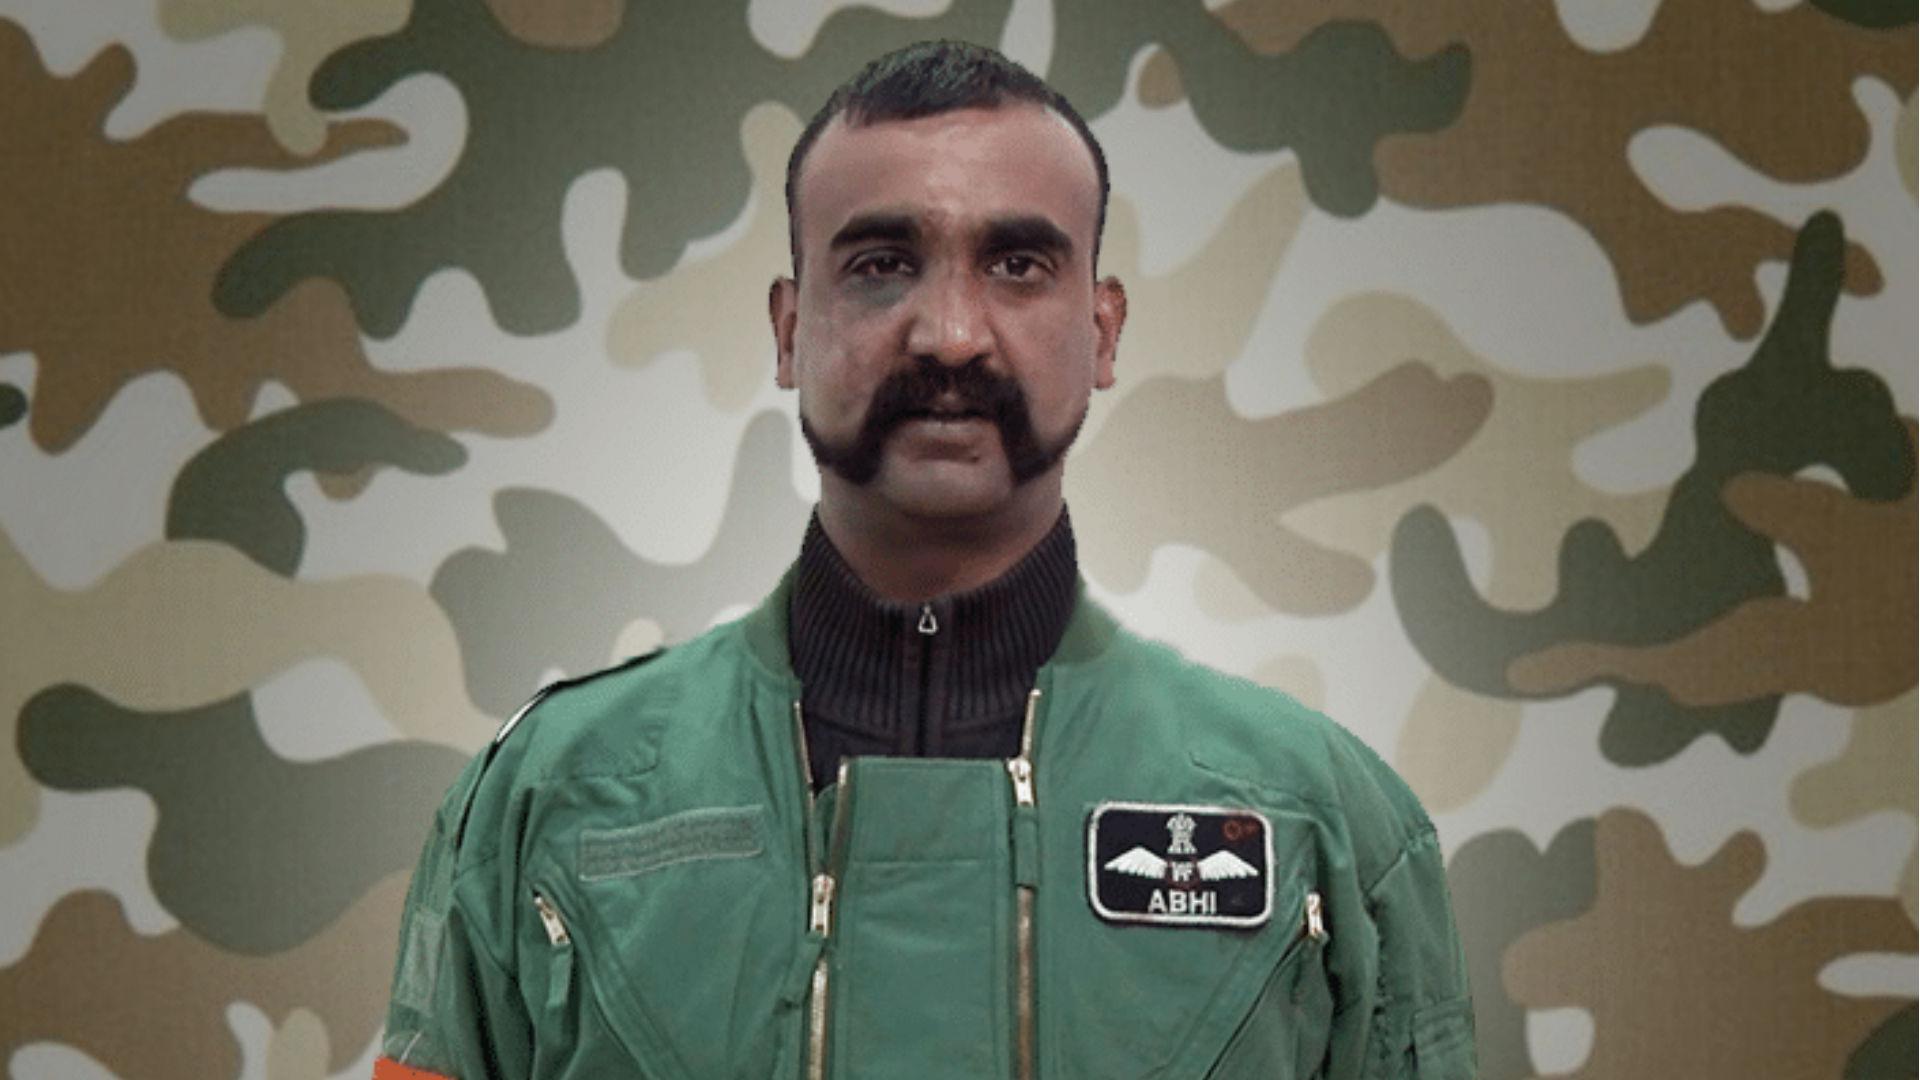 विंग कमांडर अभिनंदन वर्तमान को मिलेगा वीर चक्र, पाकिस्तान के F-16 को गिराकर सही सलामत लौटे थे भारत